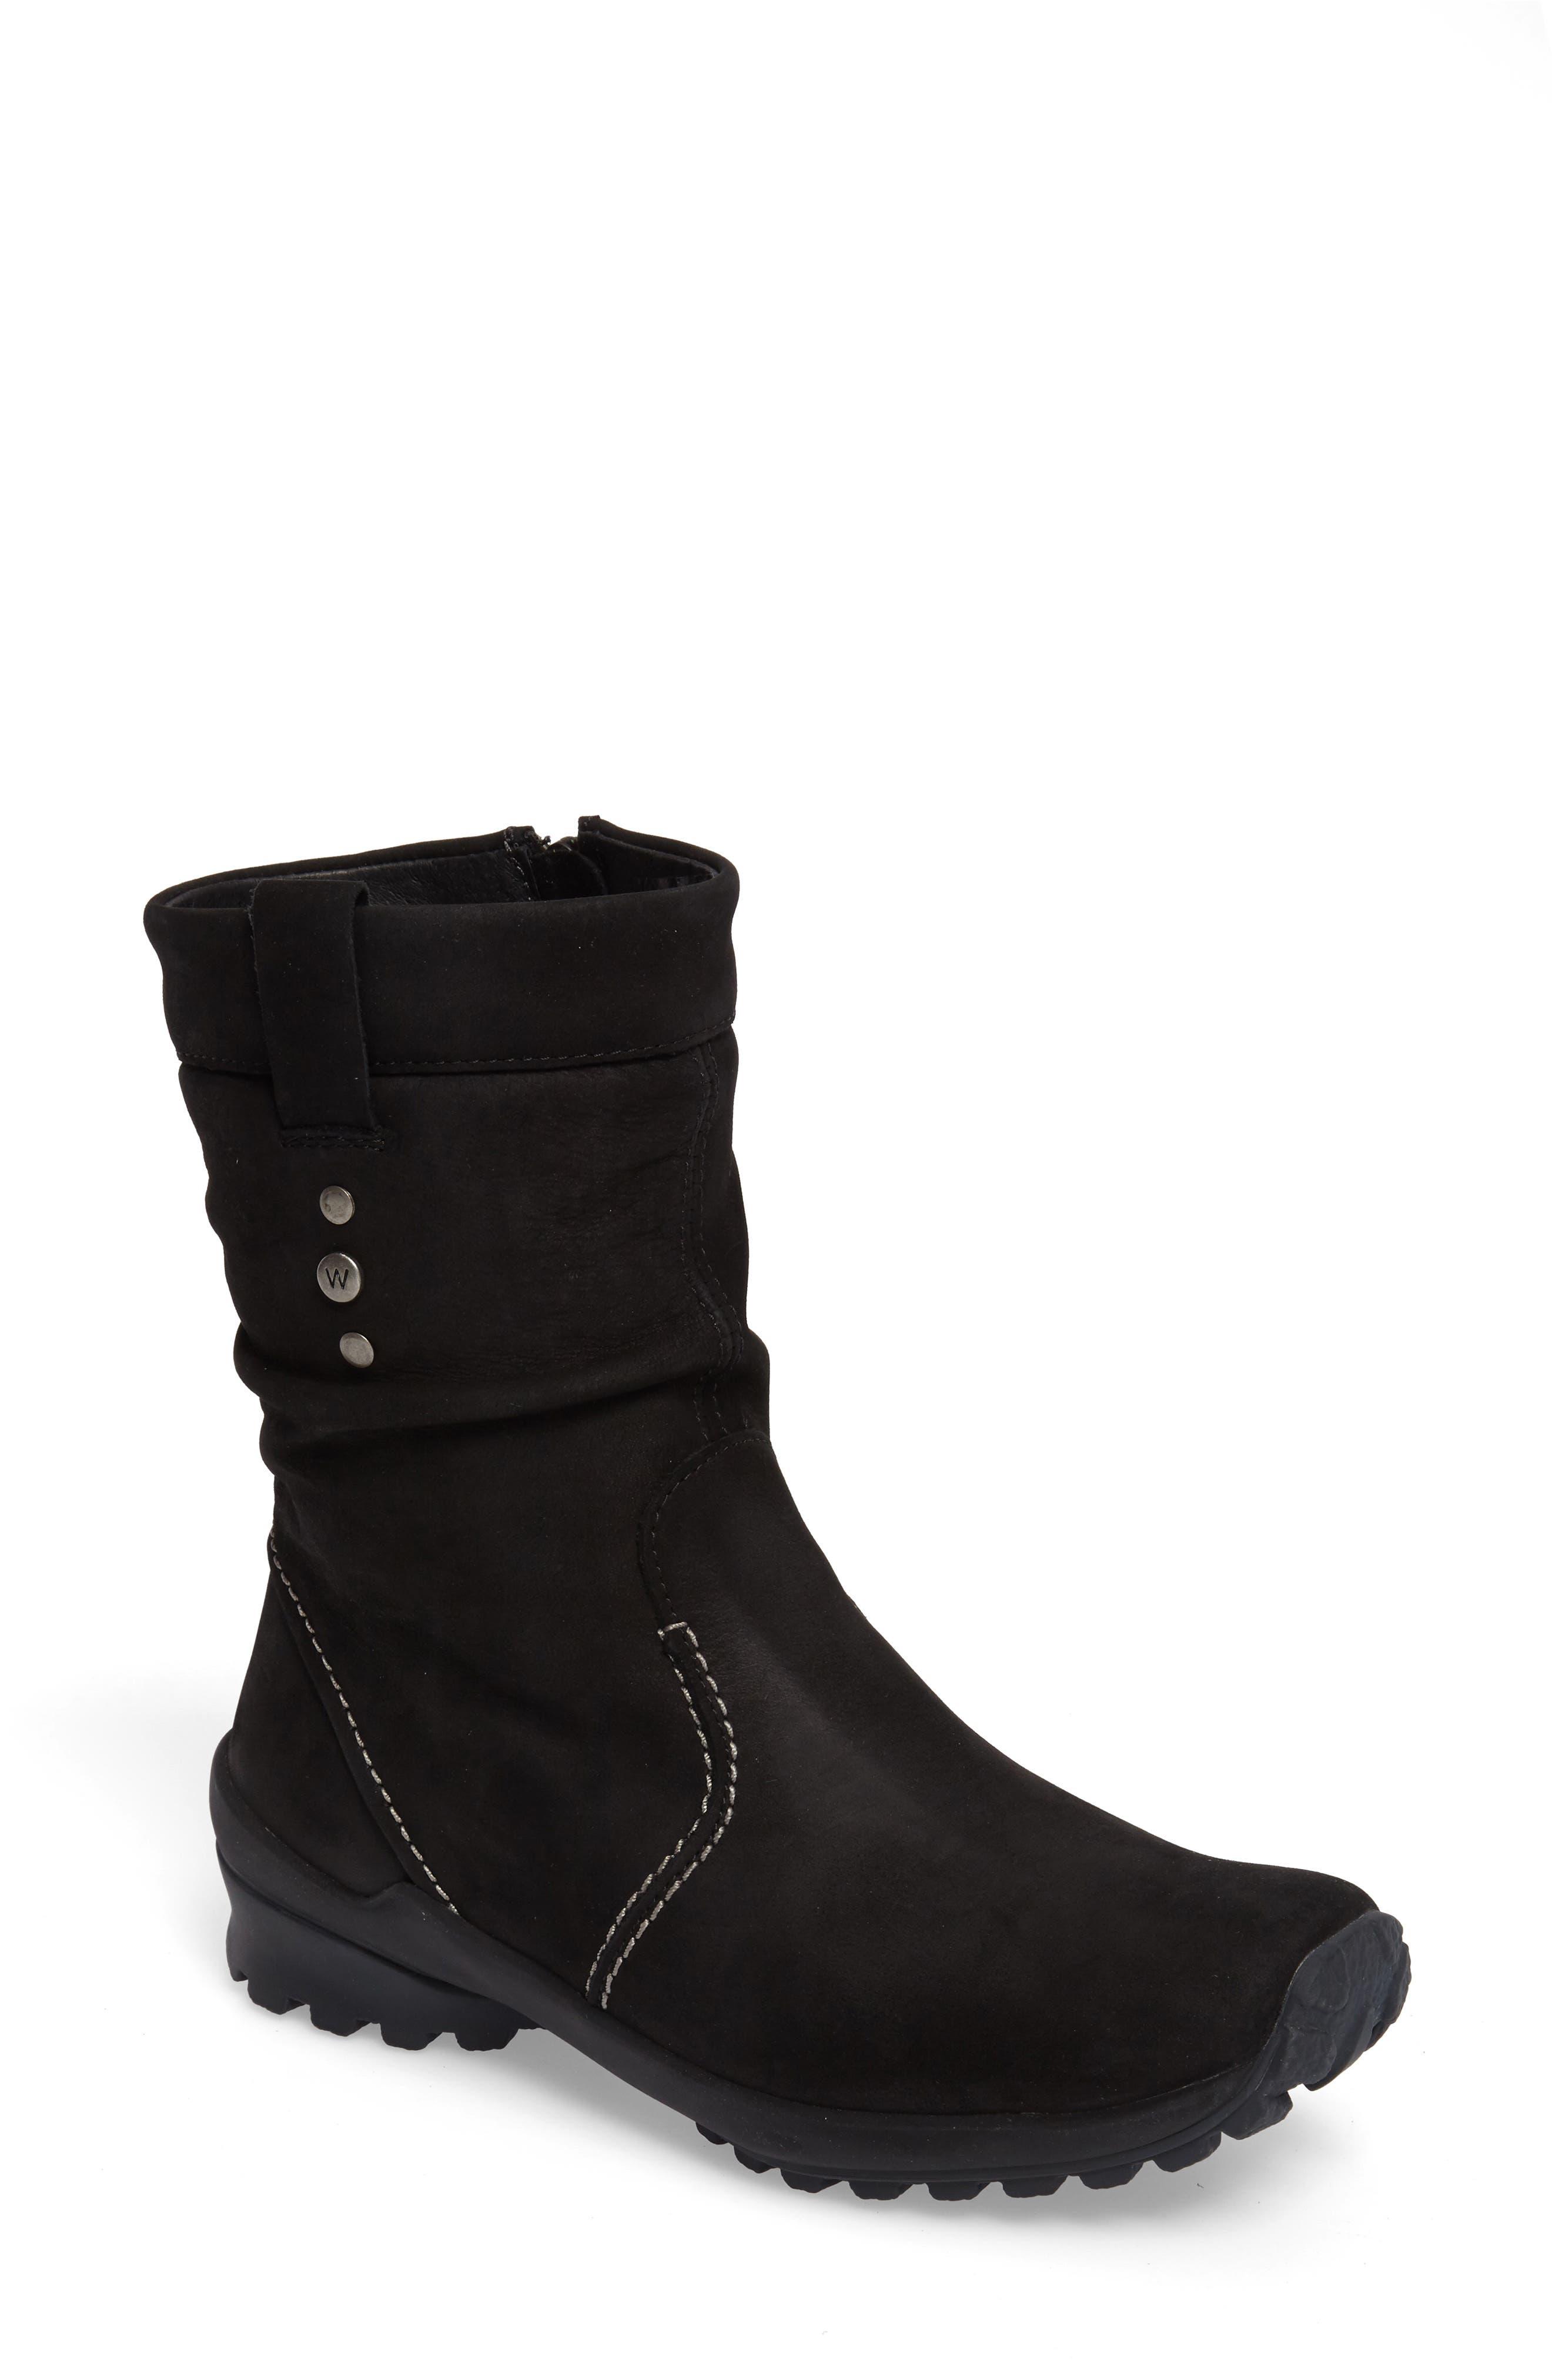 Wolky Bryce Waterproof Insulated Winter Boot (Women)